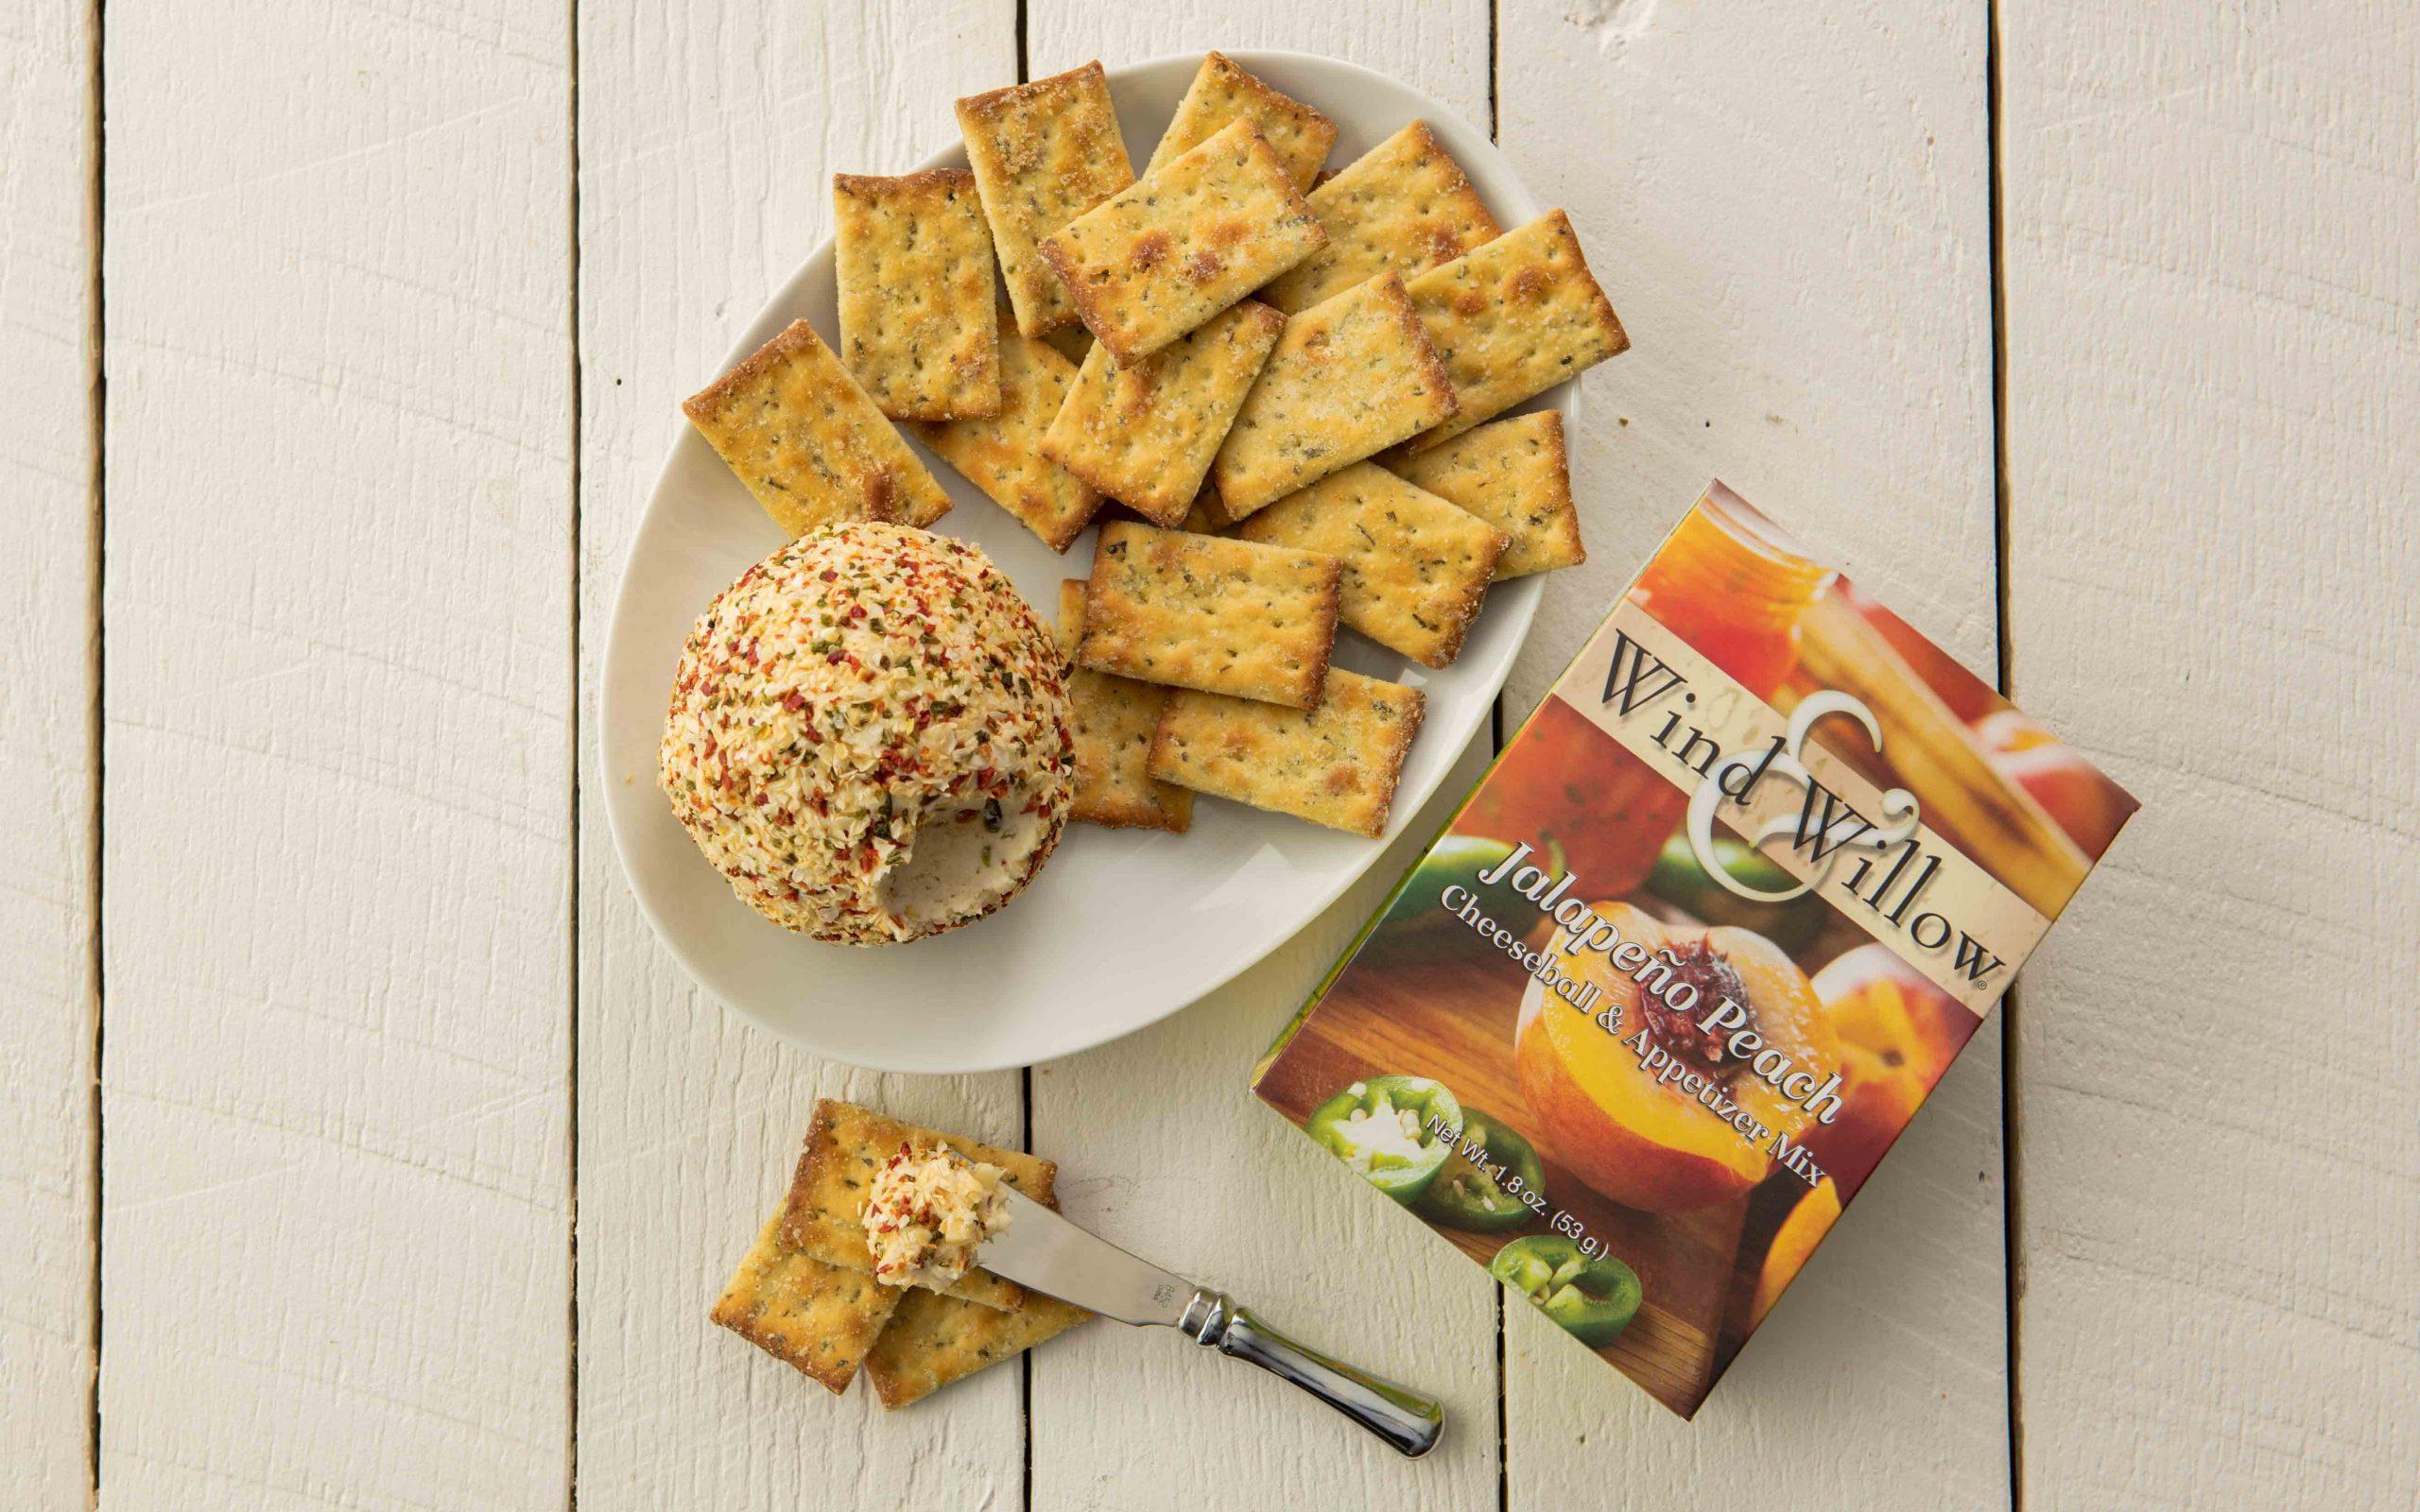 Jalapeno peach cheeseball and crackers, sweet and savory, sweet heat